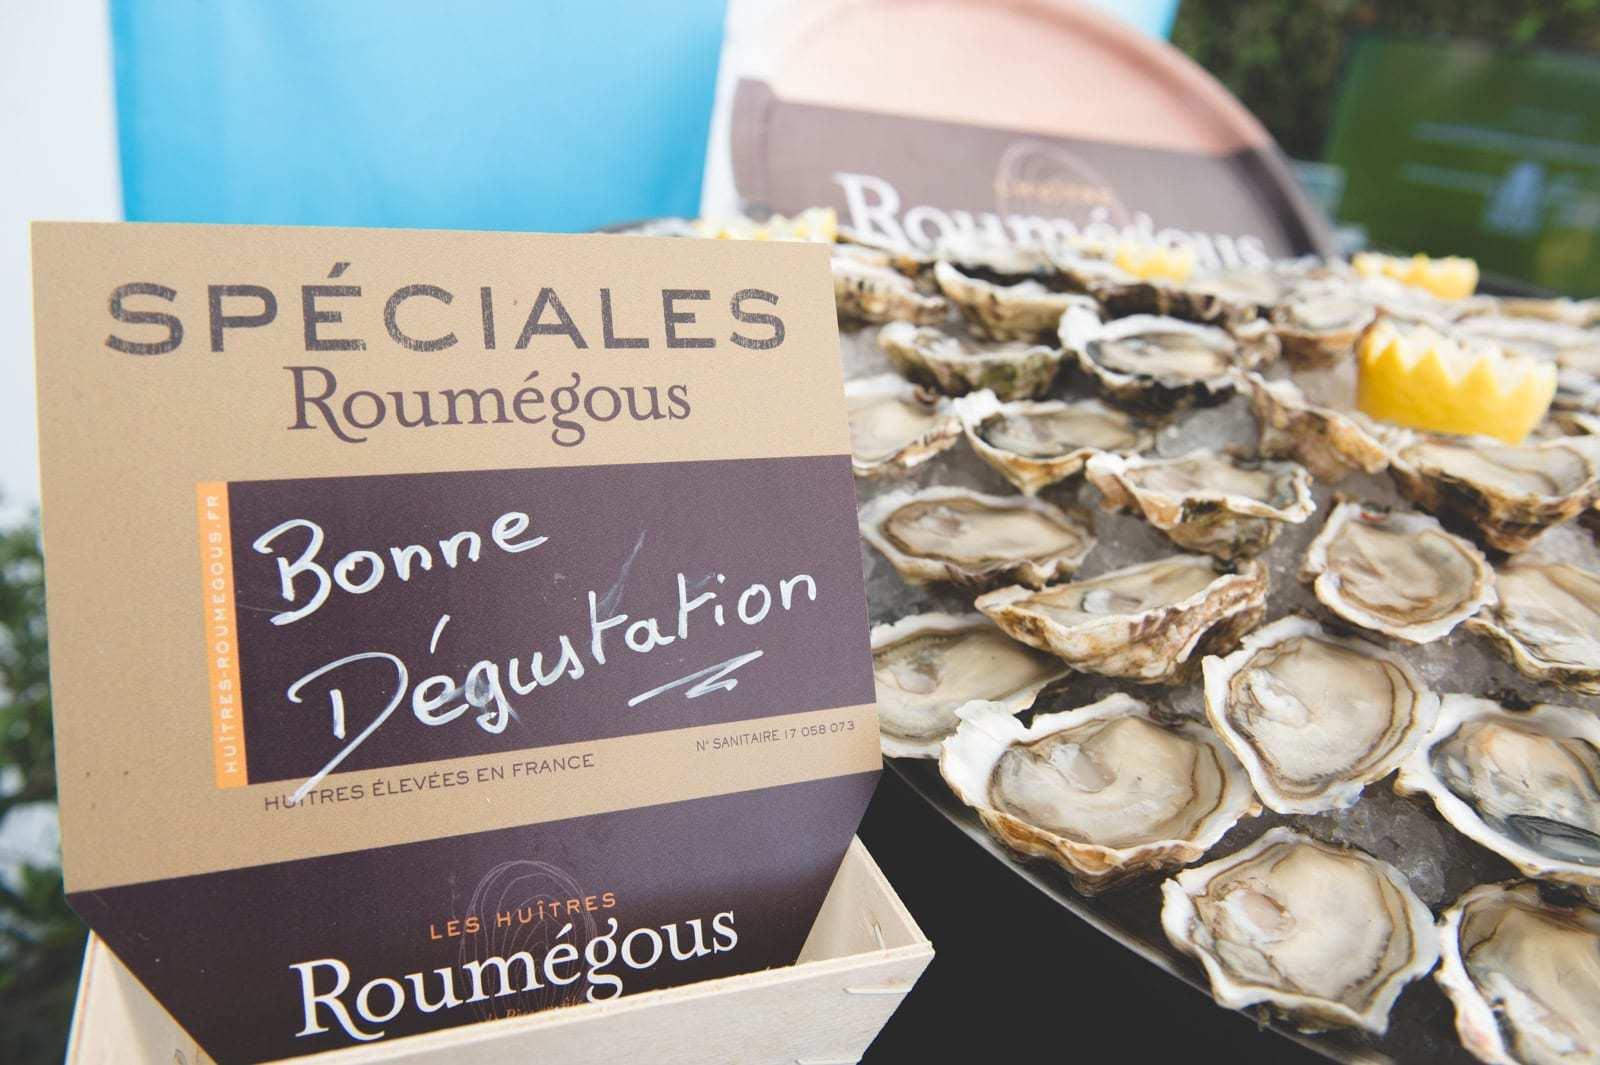 Photographe-la-rochelle-ile-de-re-charente-maritime-instants-cliches-mariage-drone-corporate-23